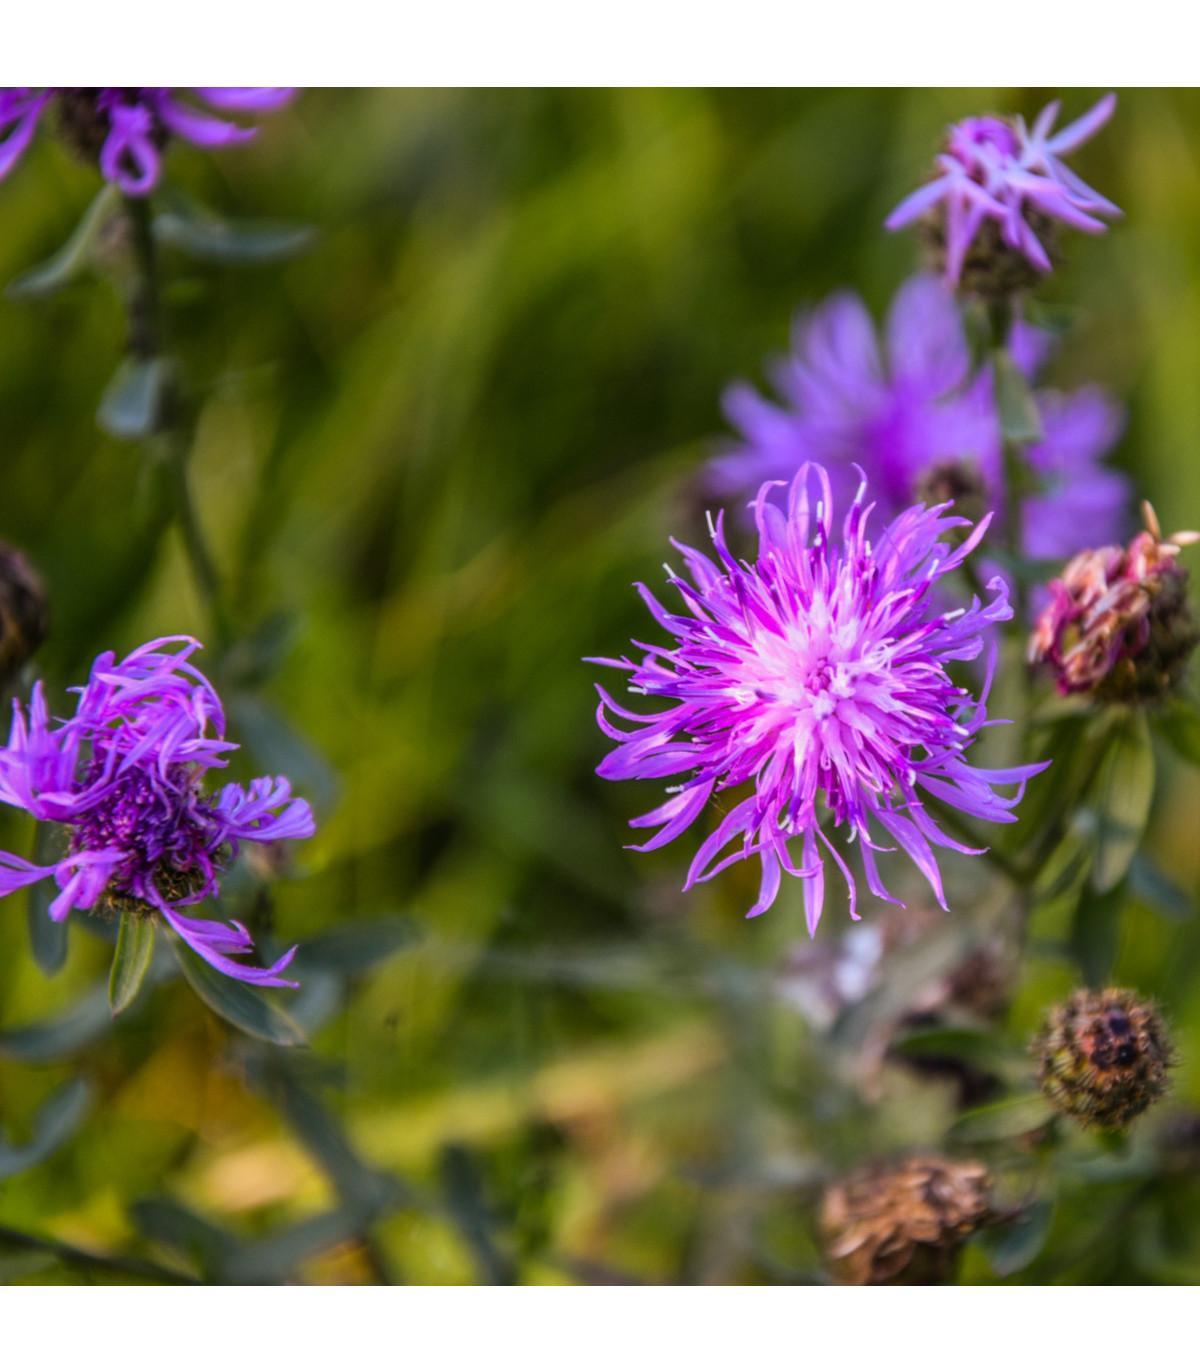 Nevädza lúčna modrá - Centaurea jaceae - semená - 200 ks